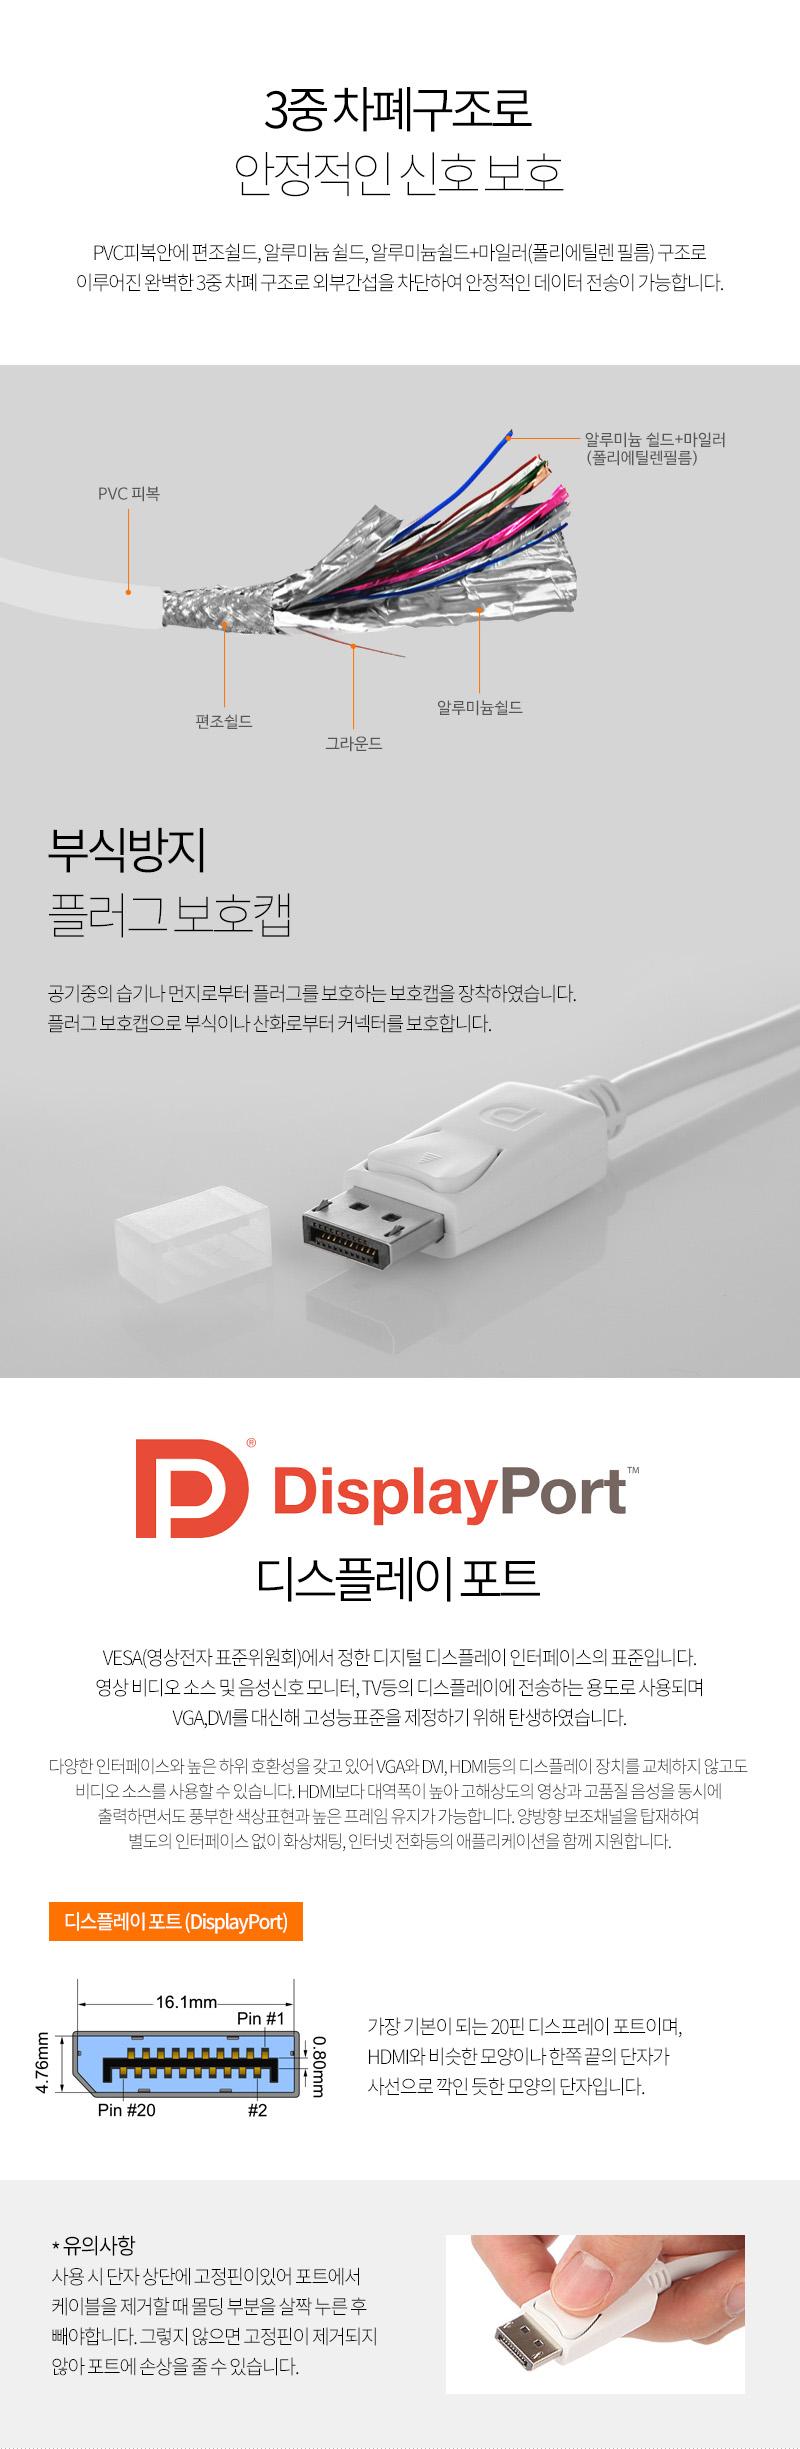 j5create  DisplayPort to HDMI 케이블 (JDC158)(1.8m)